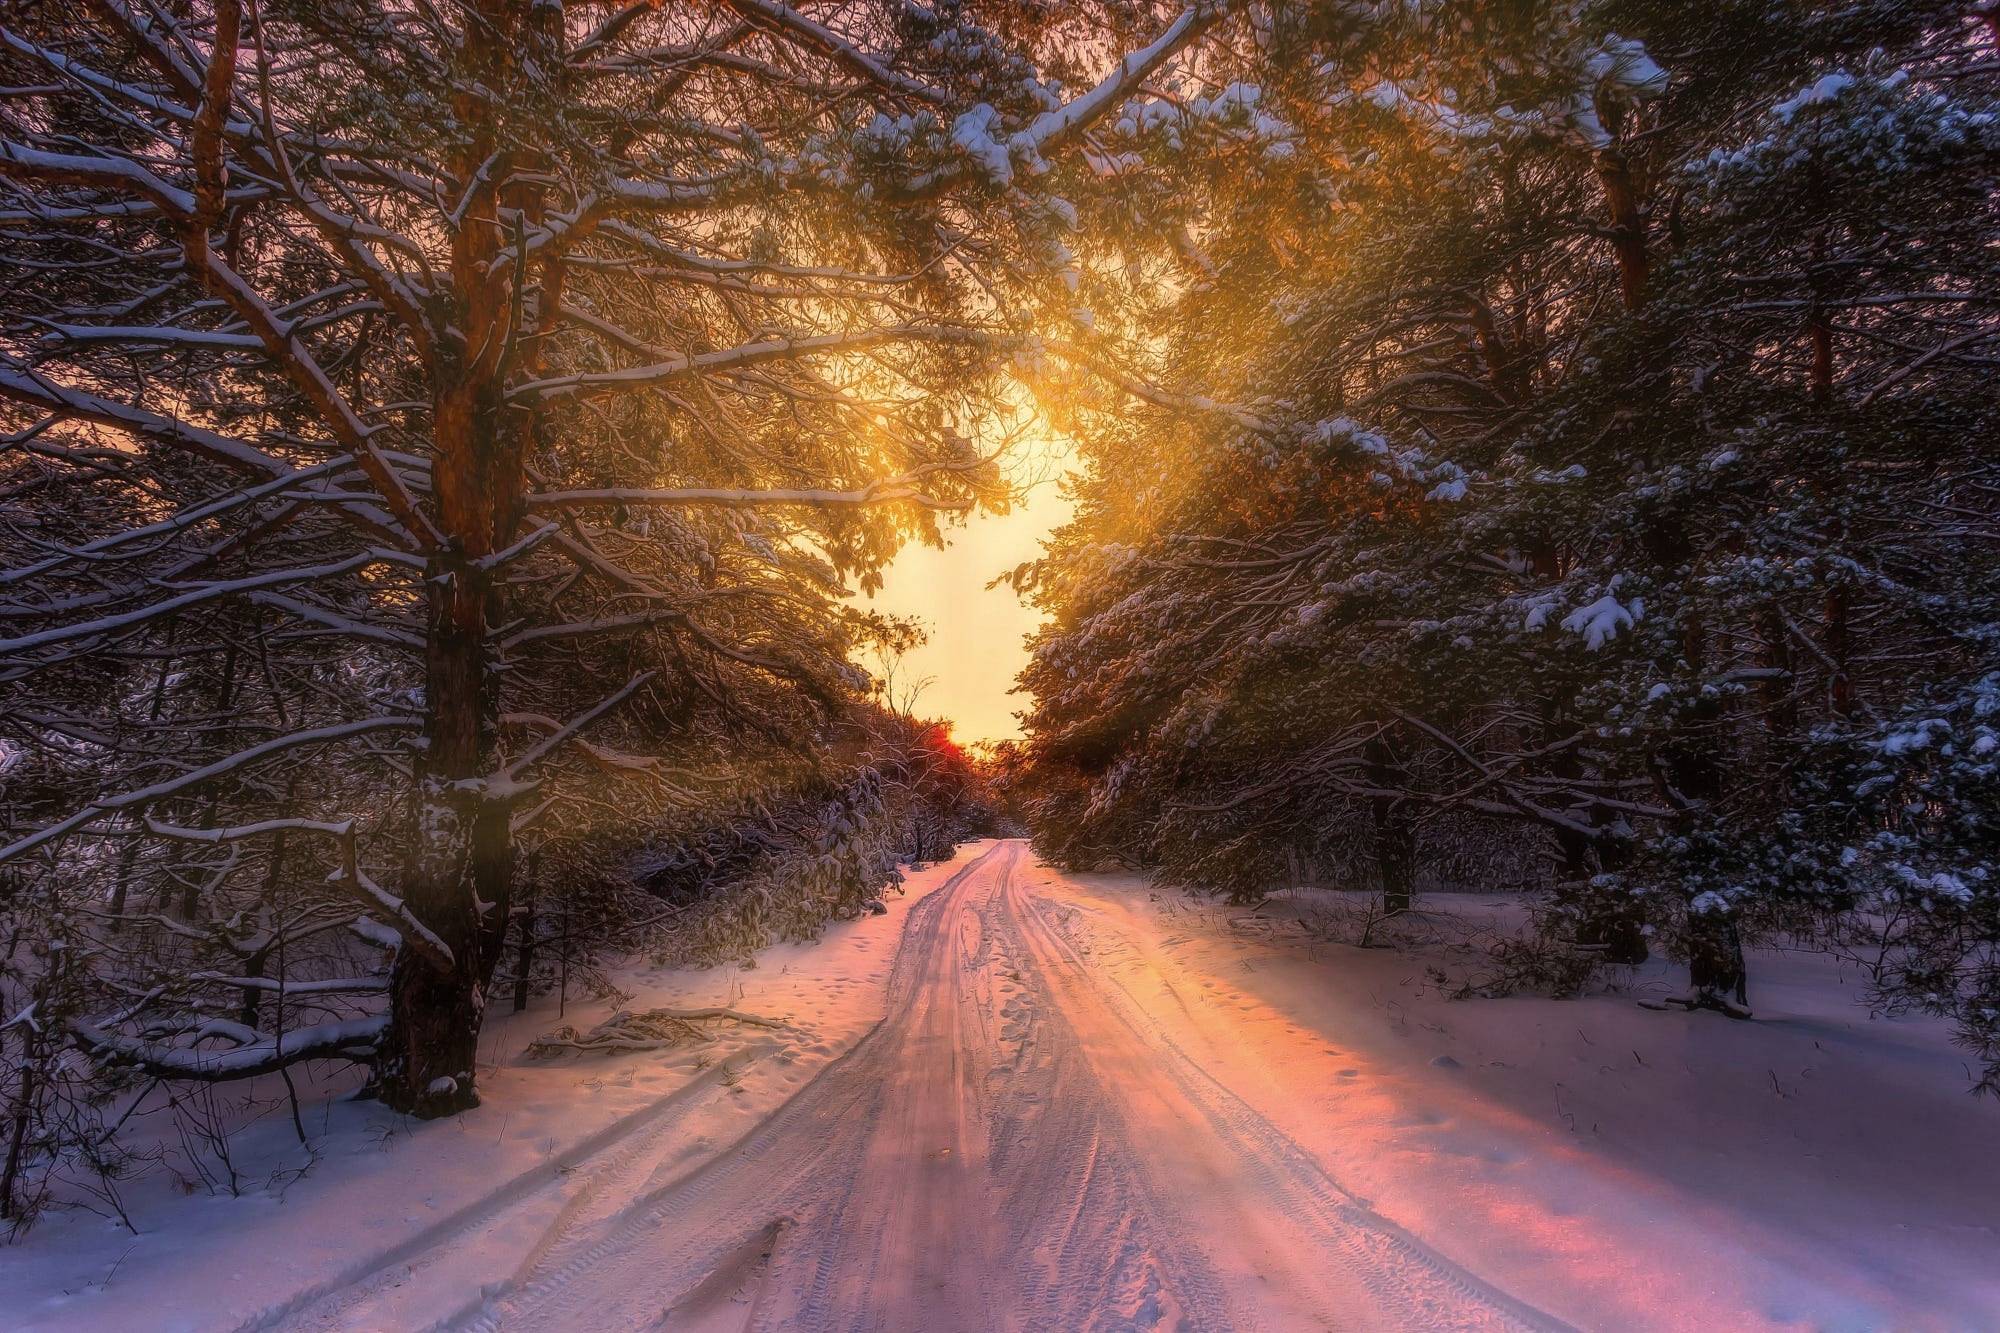 дорога зима вечер снег  № 3902584 бесплатно